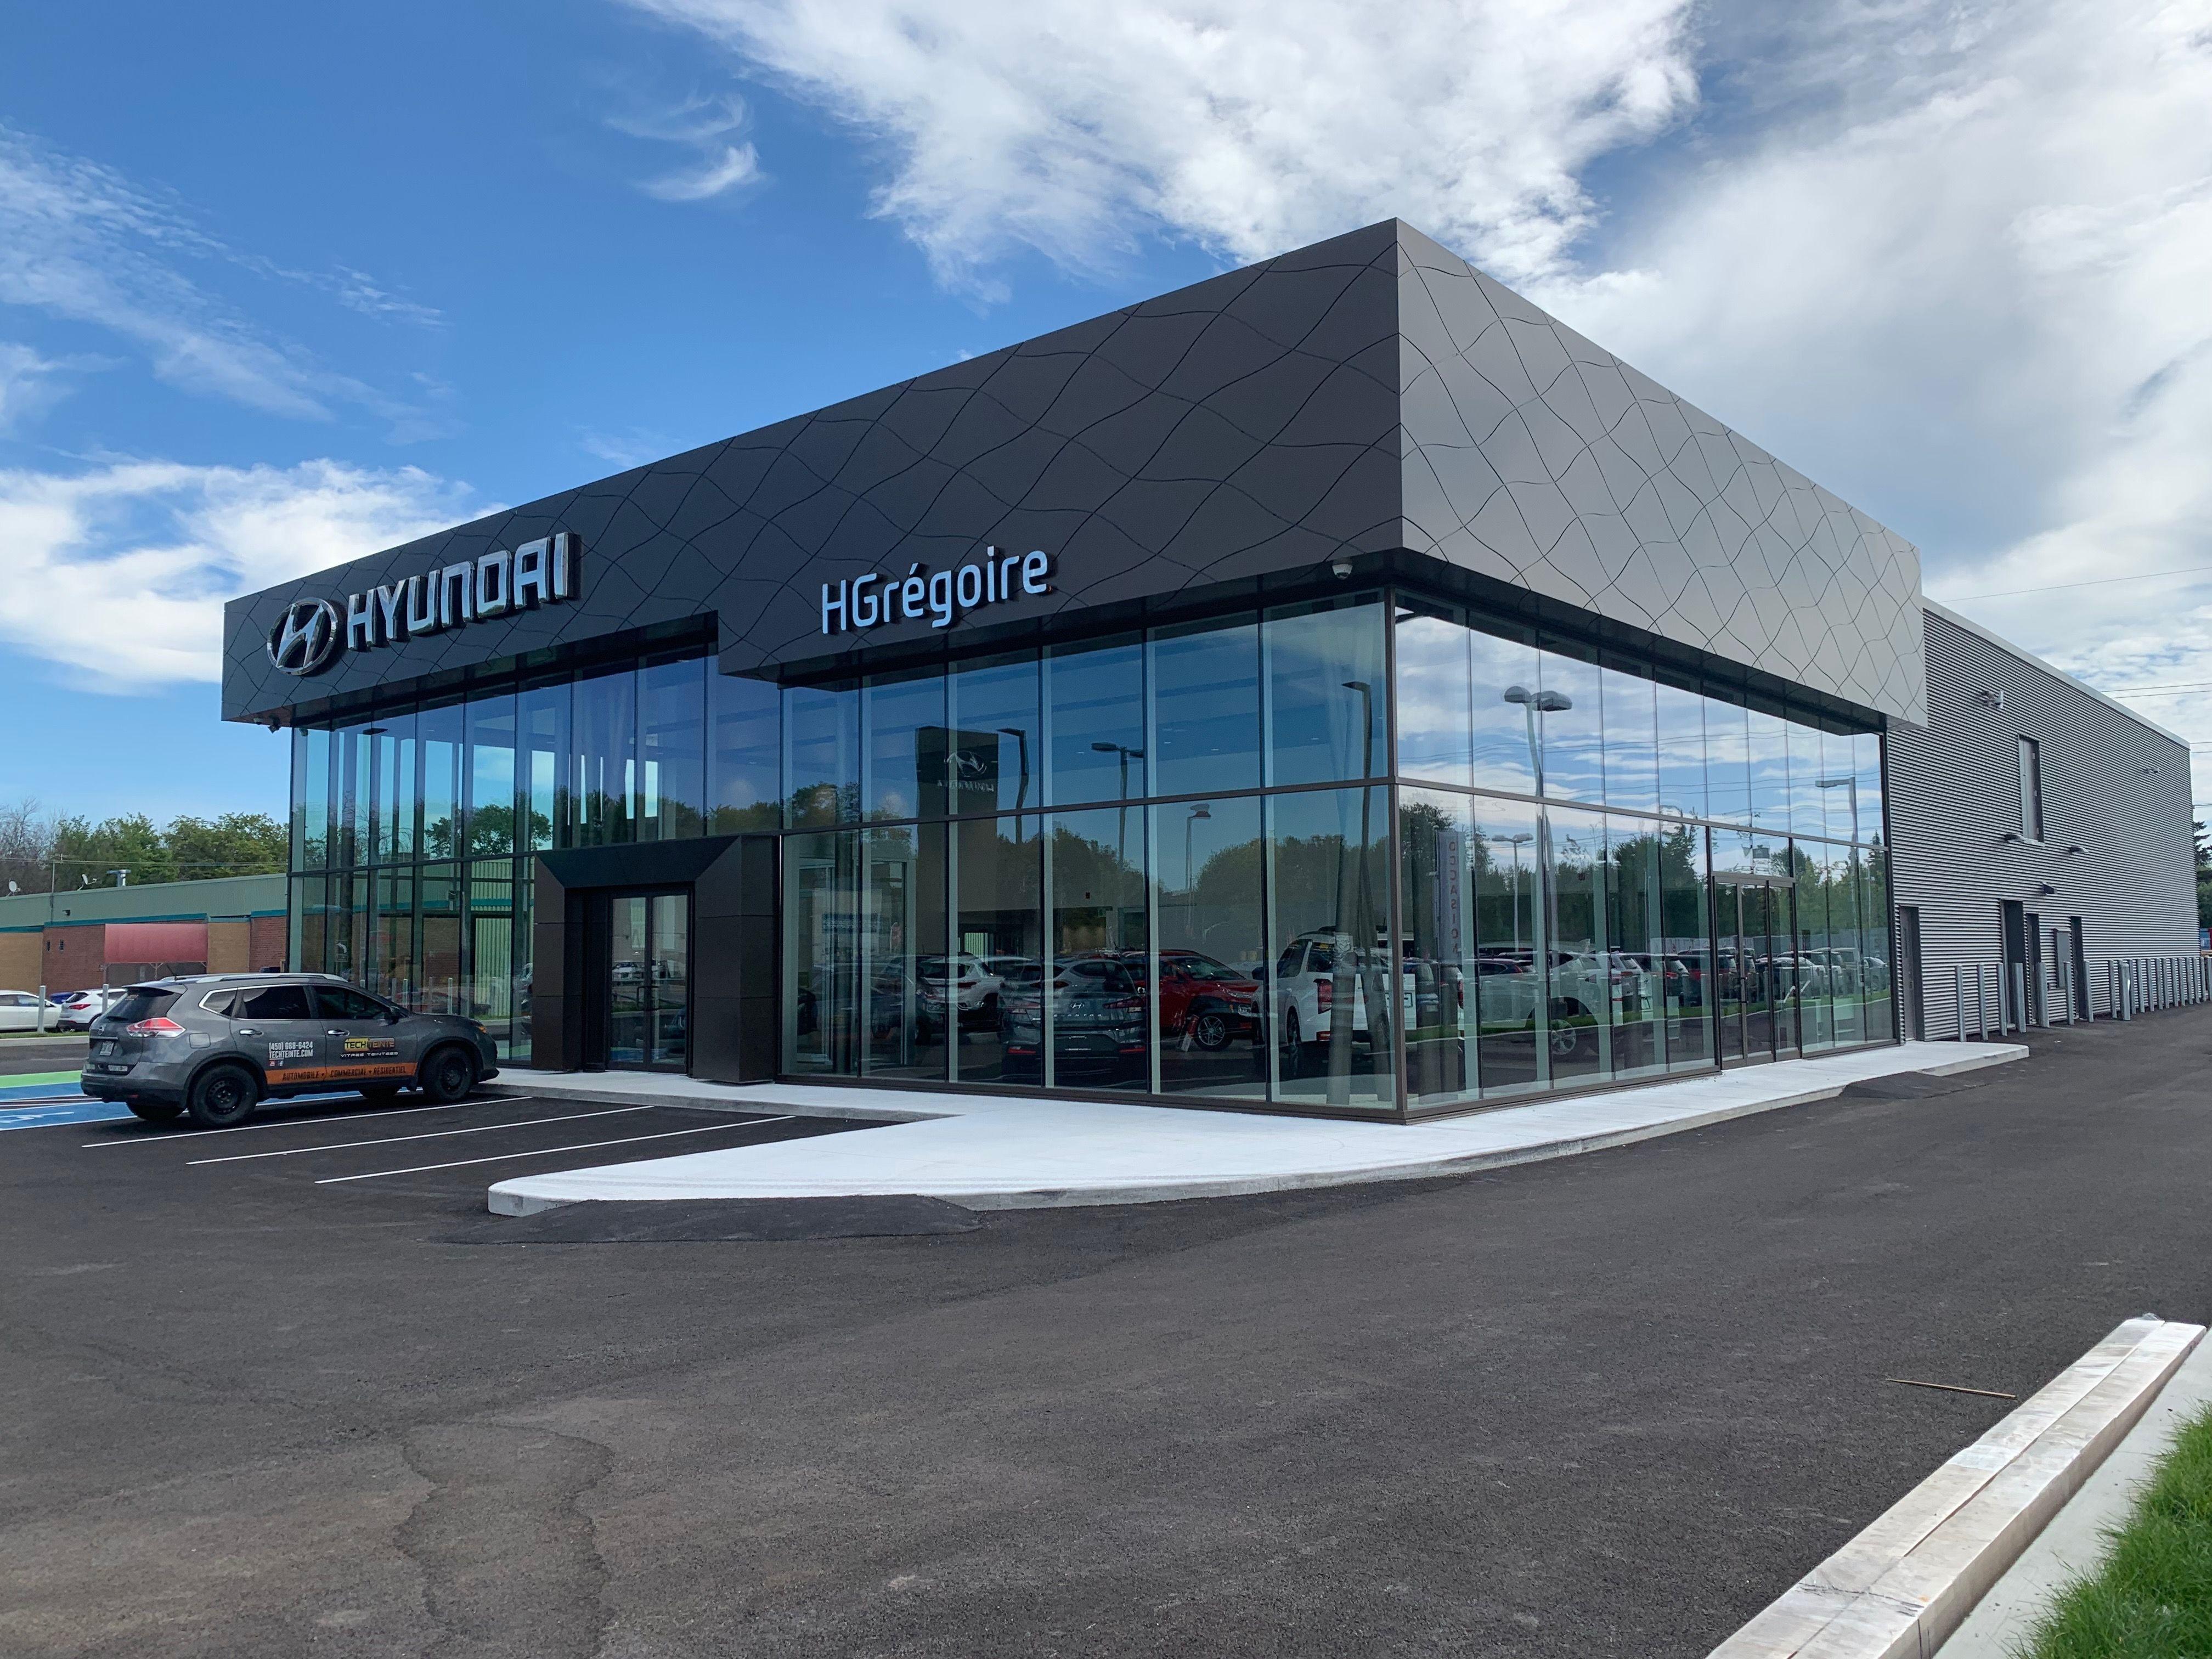 Nissan Ile Perrot >> Hgregoire Opens Hyundai Dealership On Ile Perrot Hgregoire